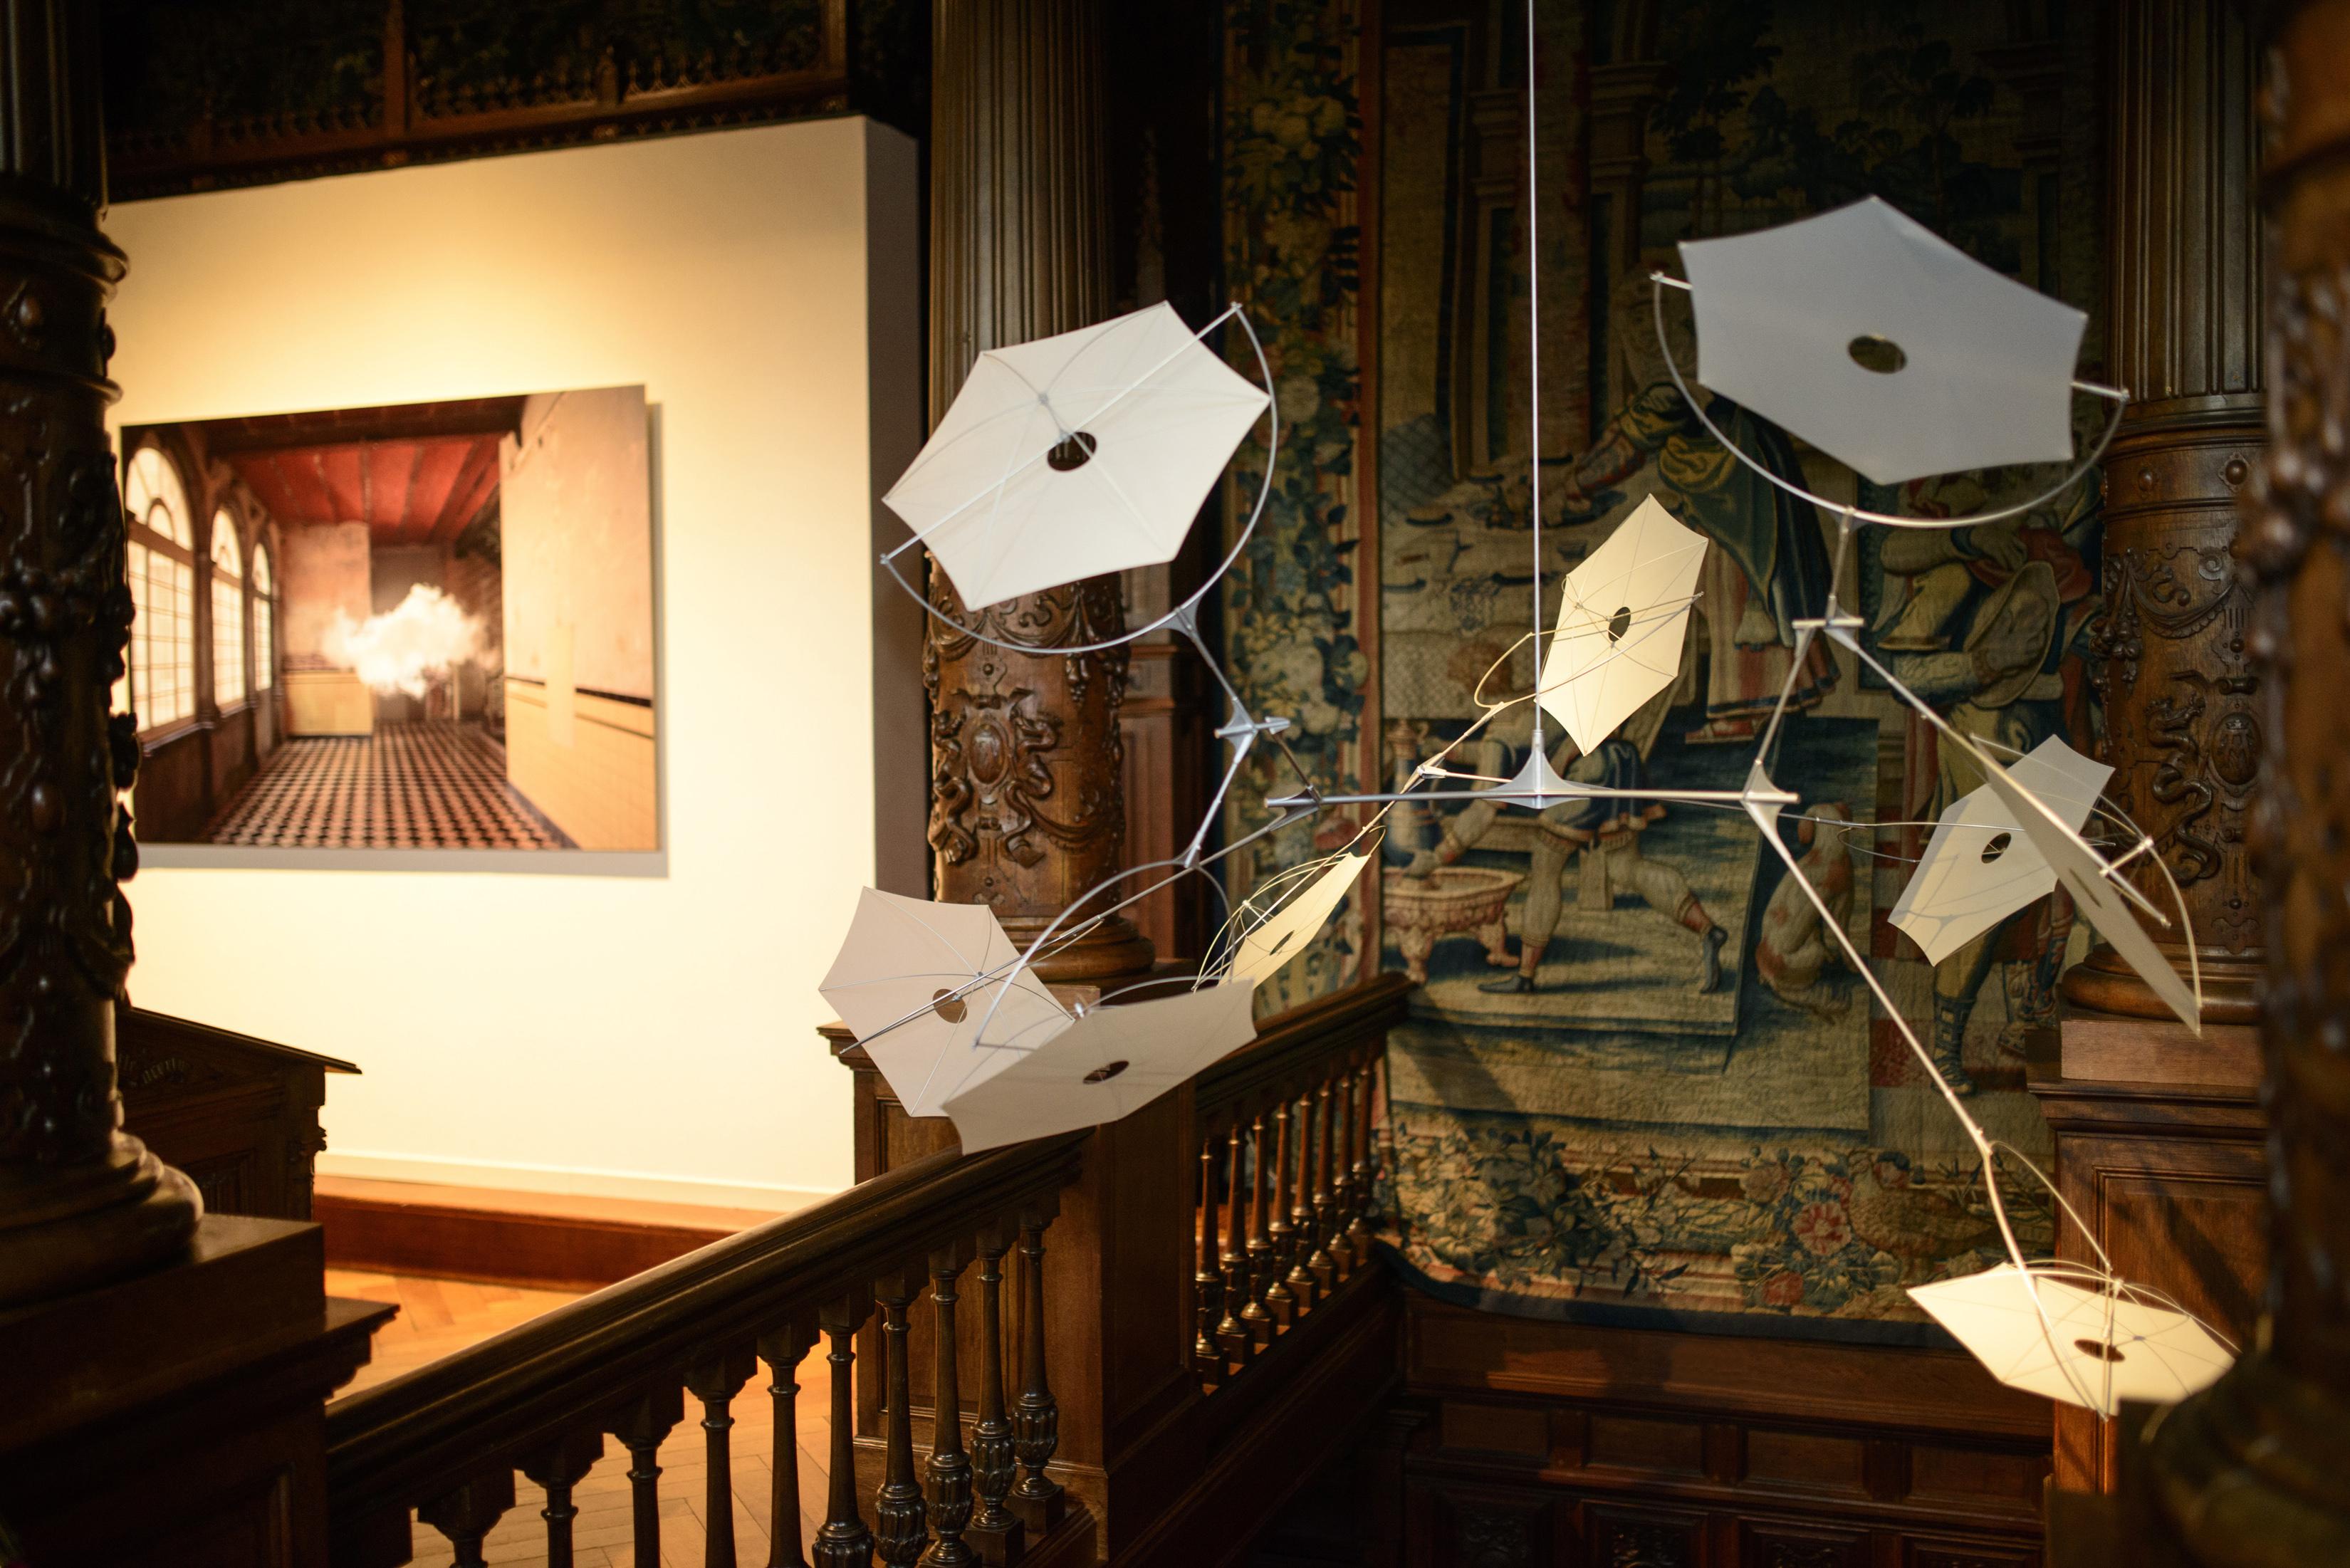 kairos castle — jeanne bucher jaeger - art gallery paris